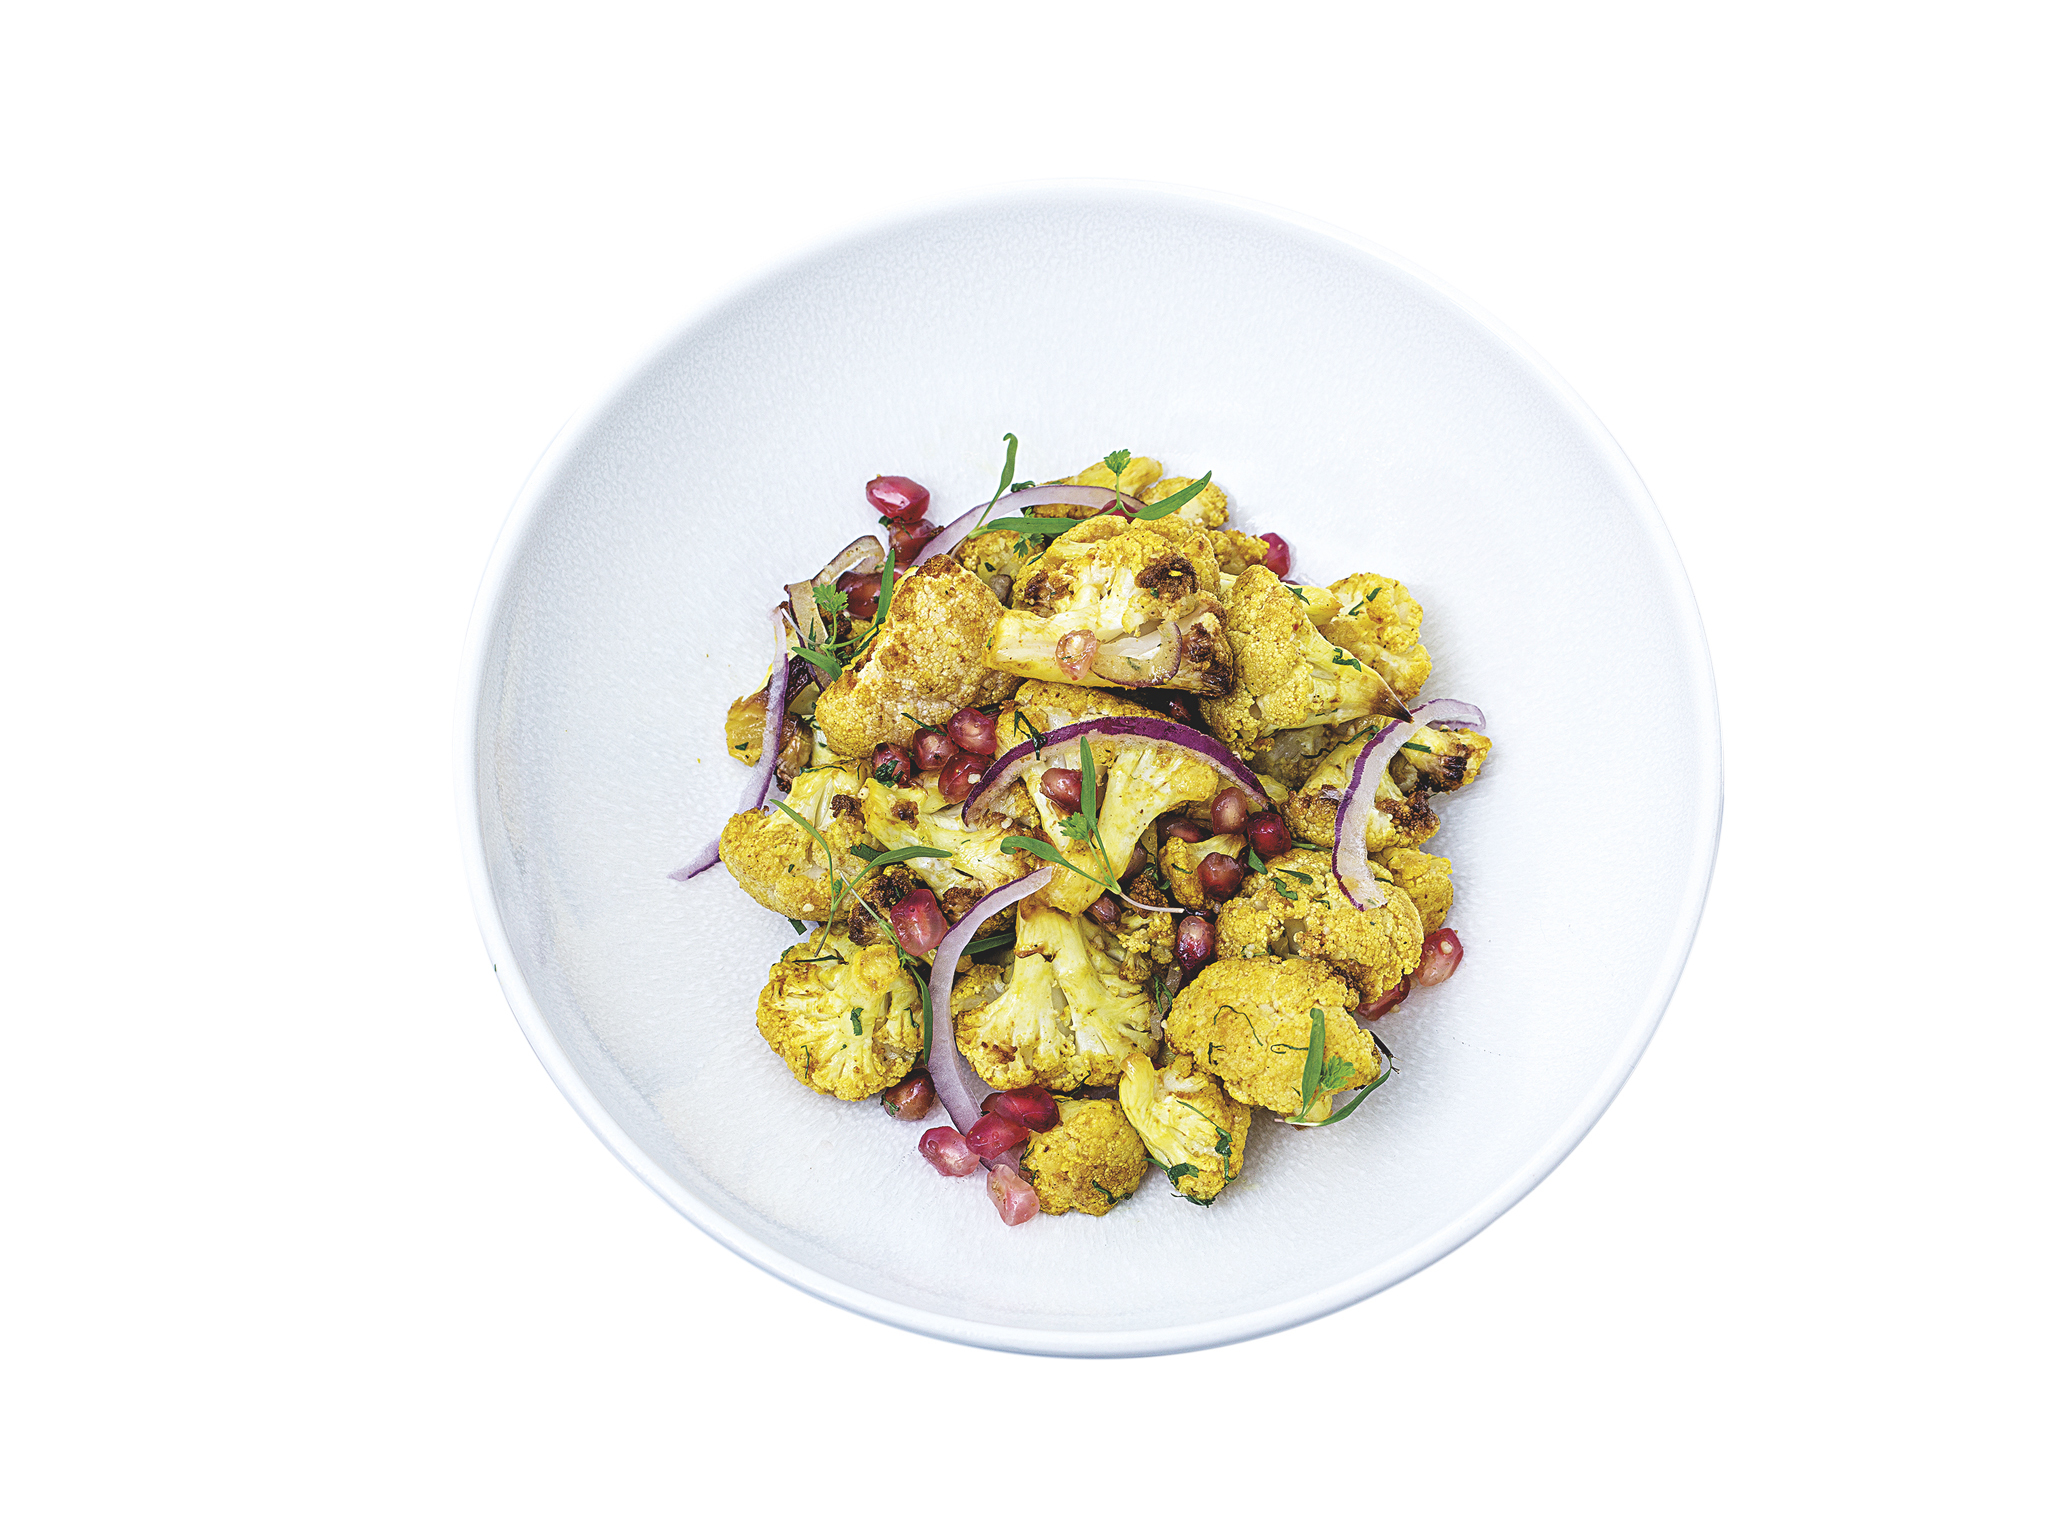 salada de couve flor com caril, romã e avelã